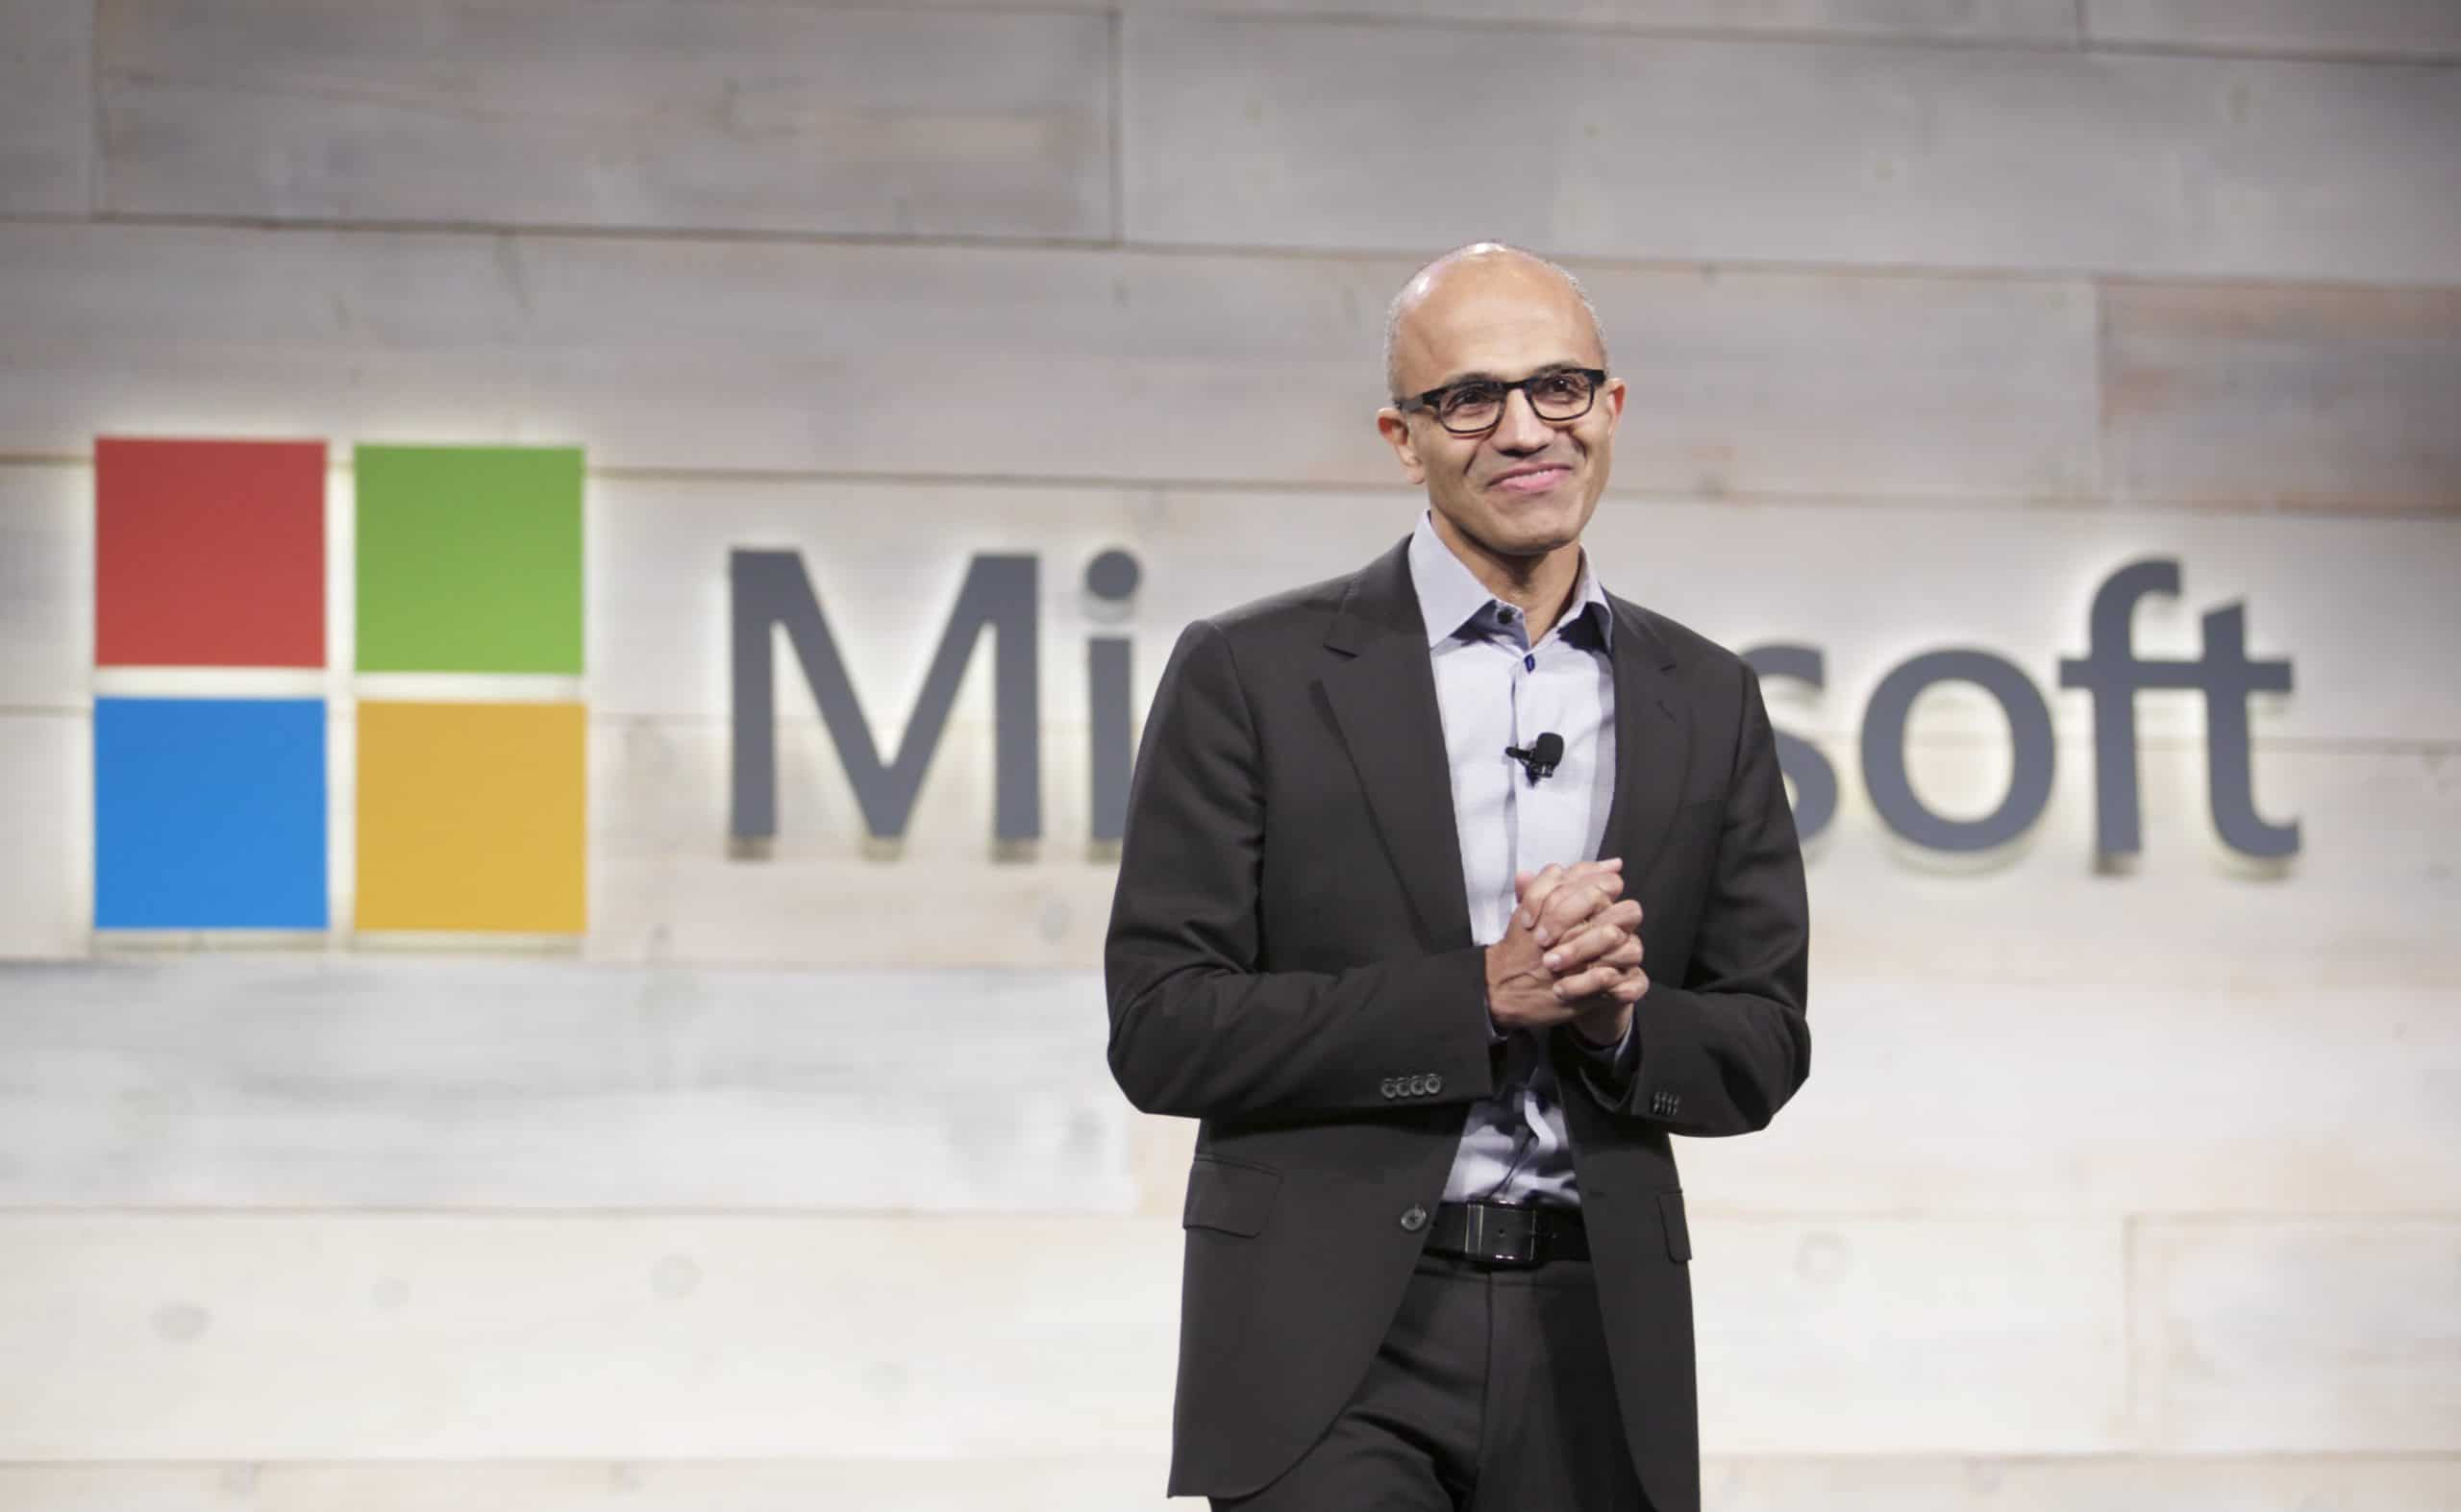 Microsoft Holds Annual Shareholder Meeting